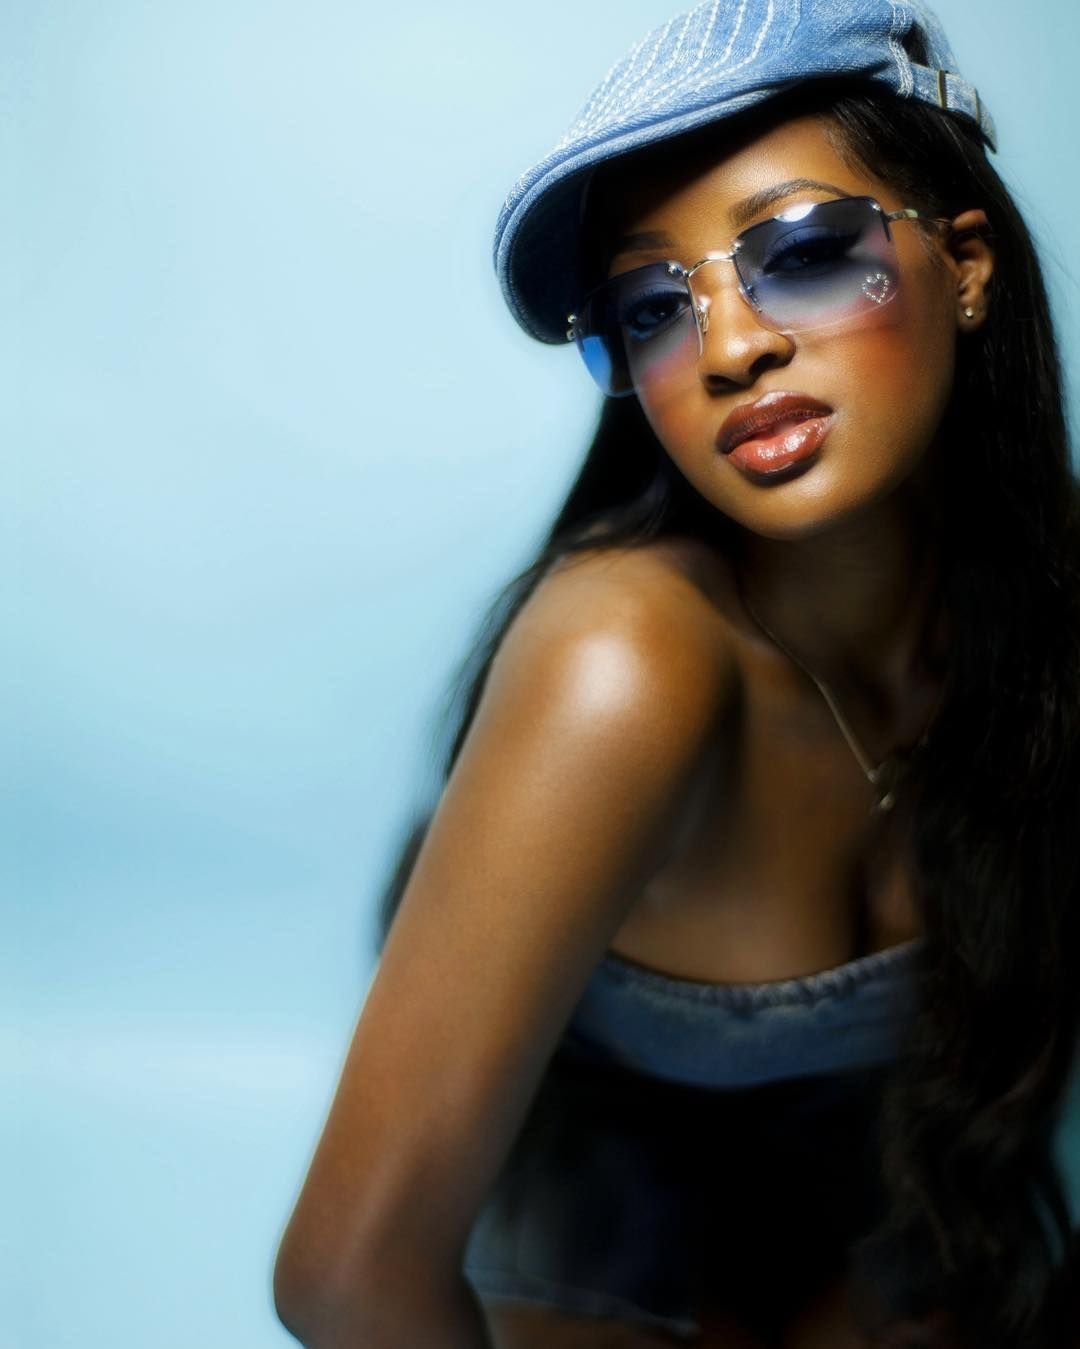 Black Girl Fashion Trends: Black Girl Aesthetic, Early 2000s